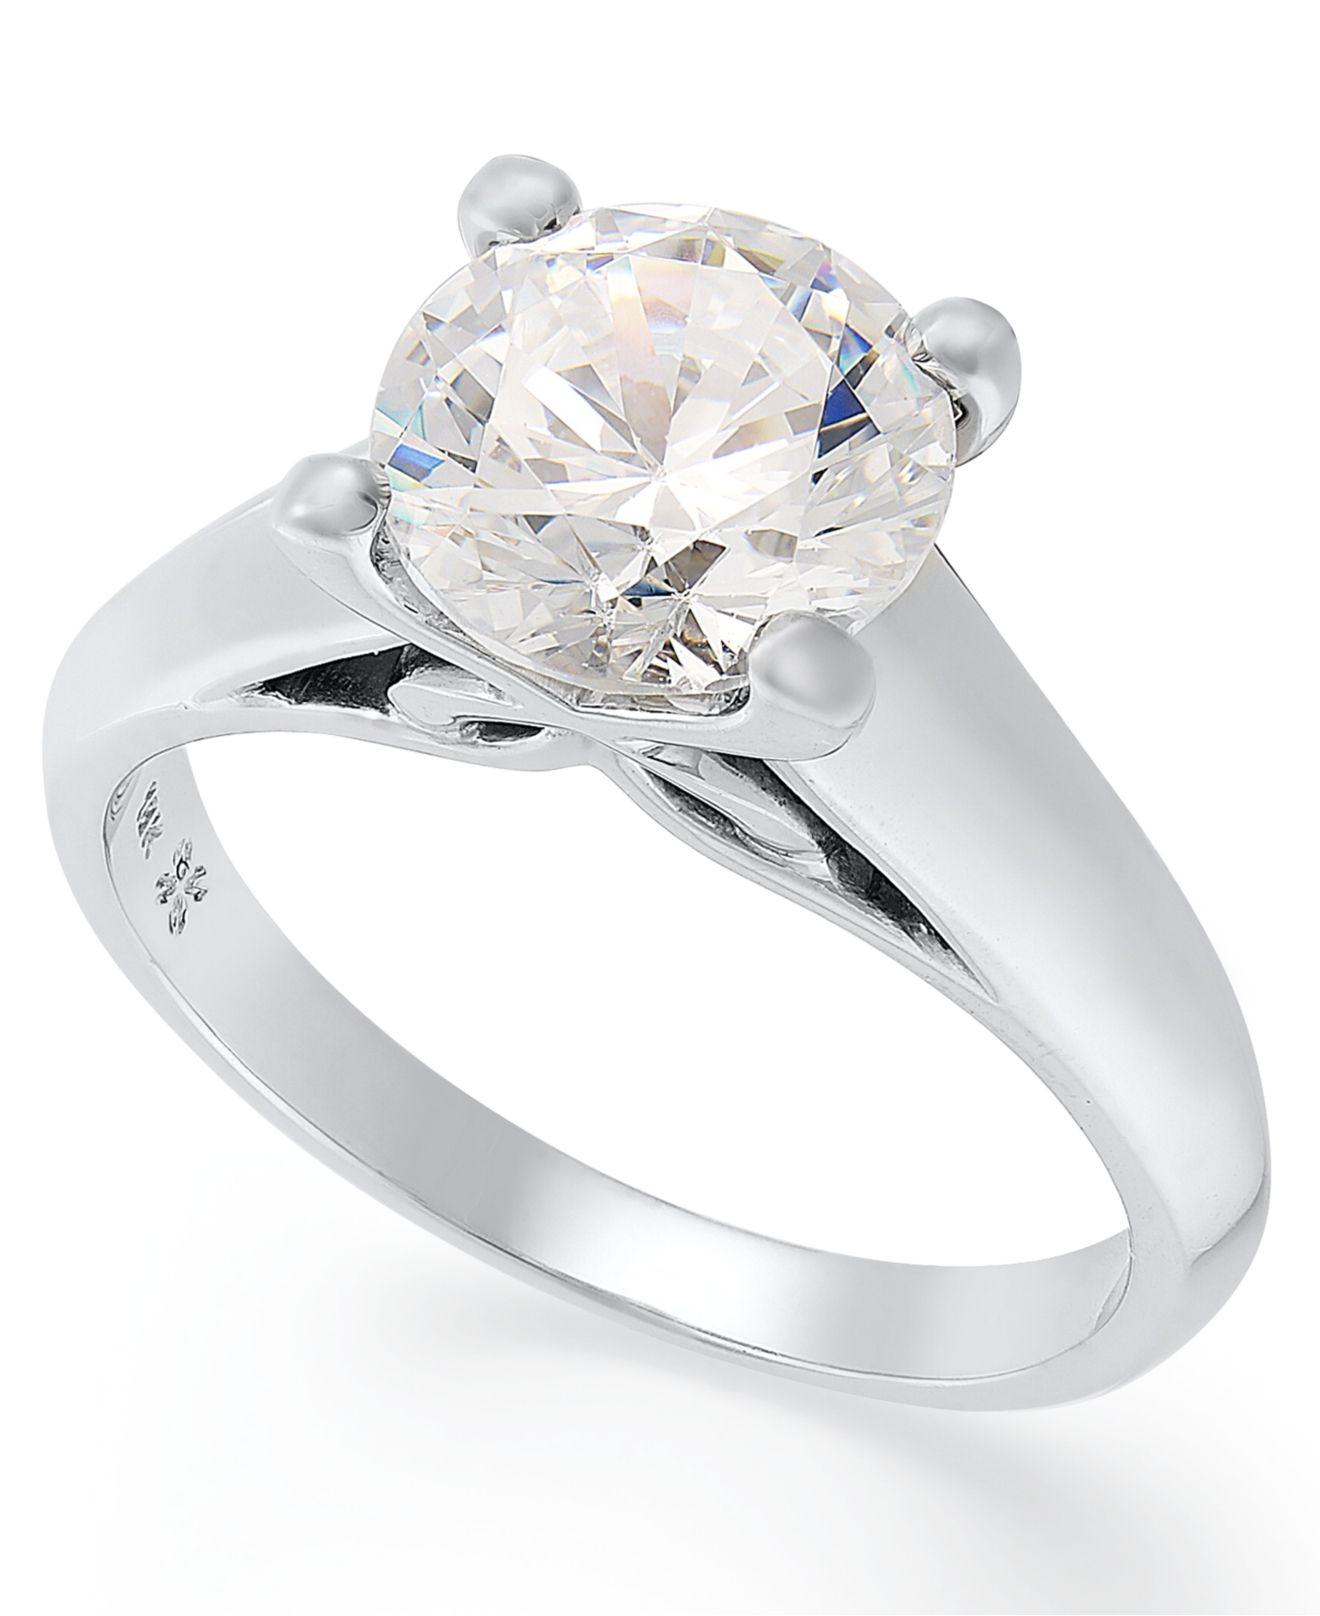 Macy S Certified Diamond Rings